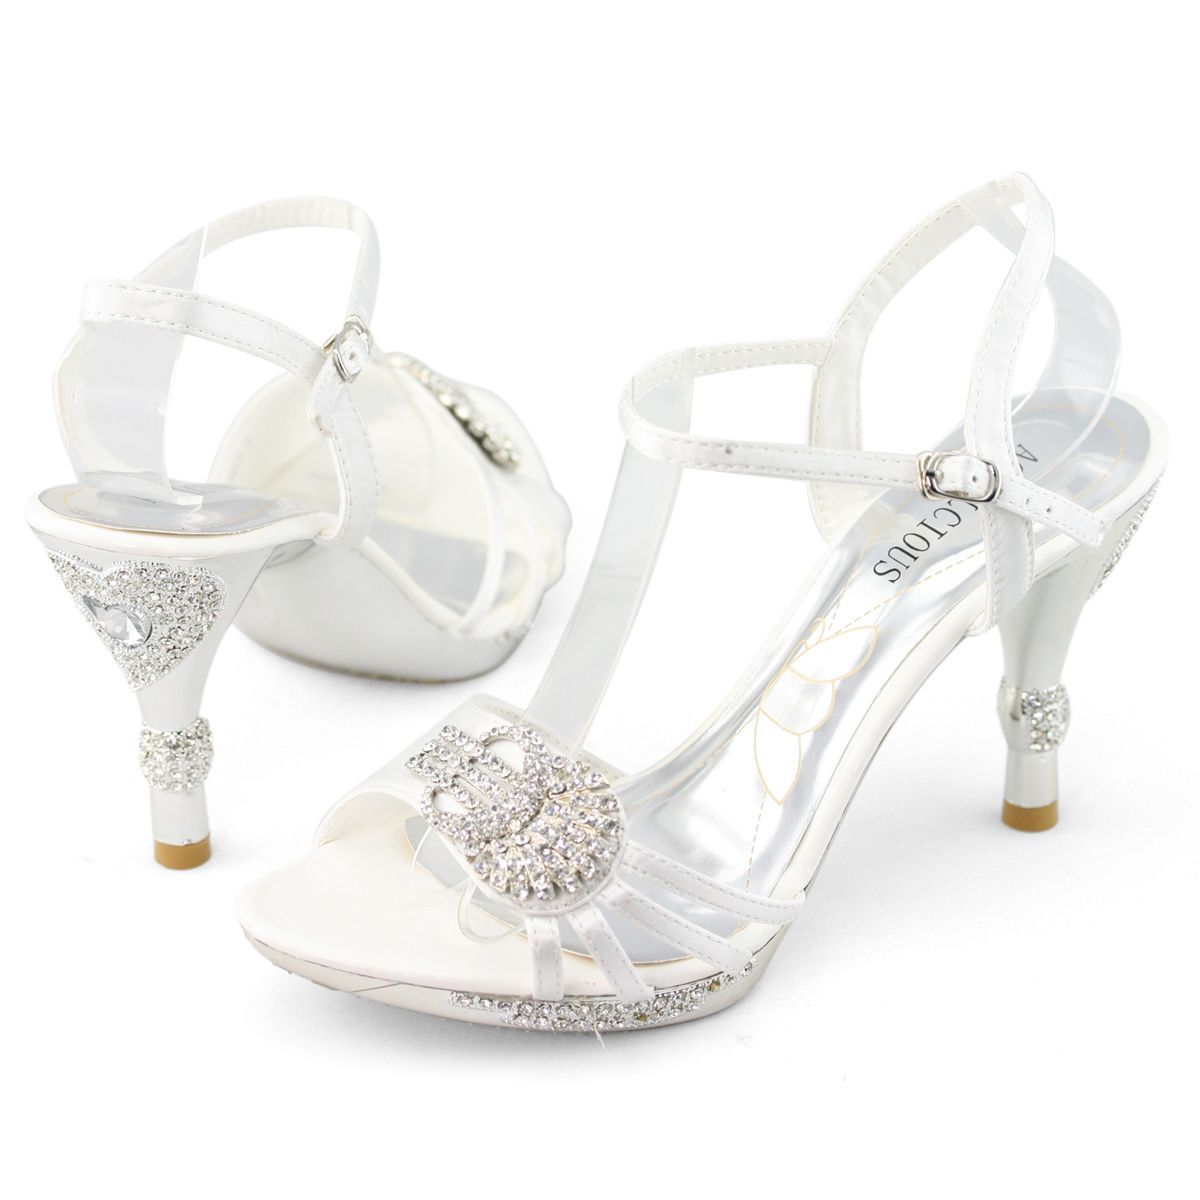 White Low Heels Weddings Shoe Womens White Low Heel Diamond Pumps Wedding Shoes Sat White Wedding Shoes Low Heel Wedding Shoes Low Heel Wedding Shoes Heels